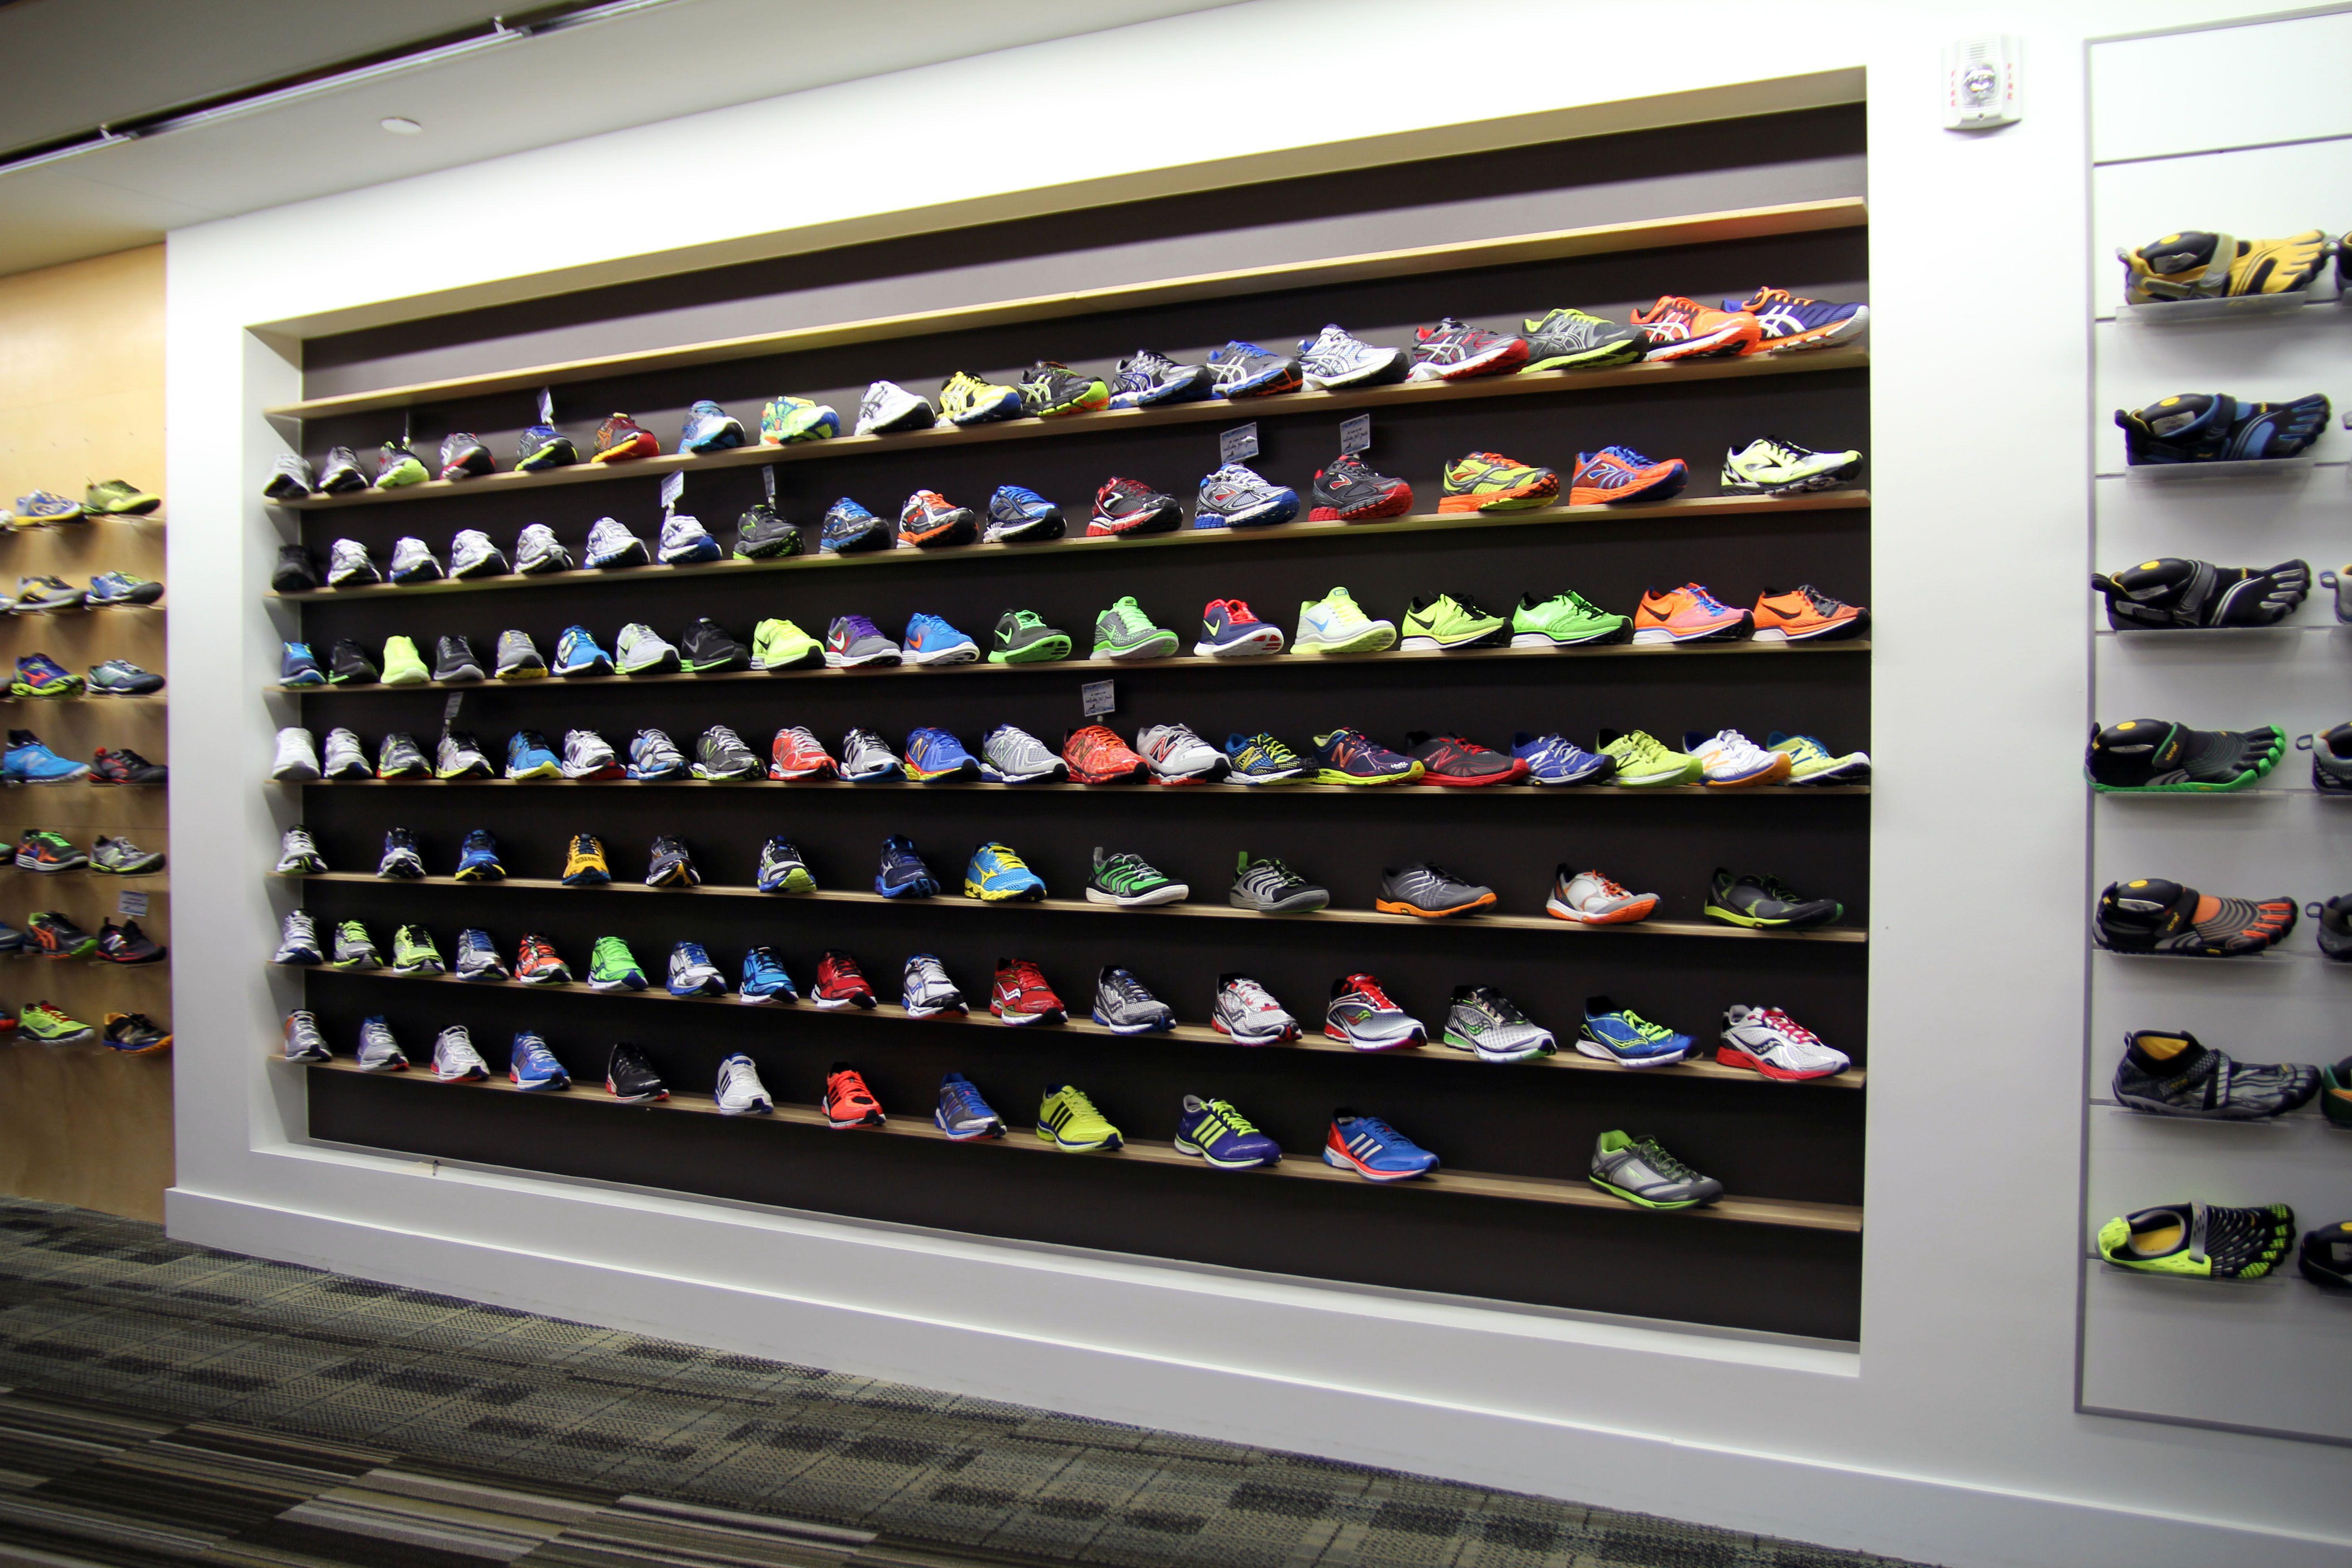 Expensive Shoe Shops Near Me